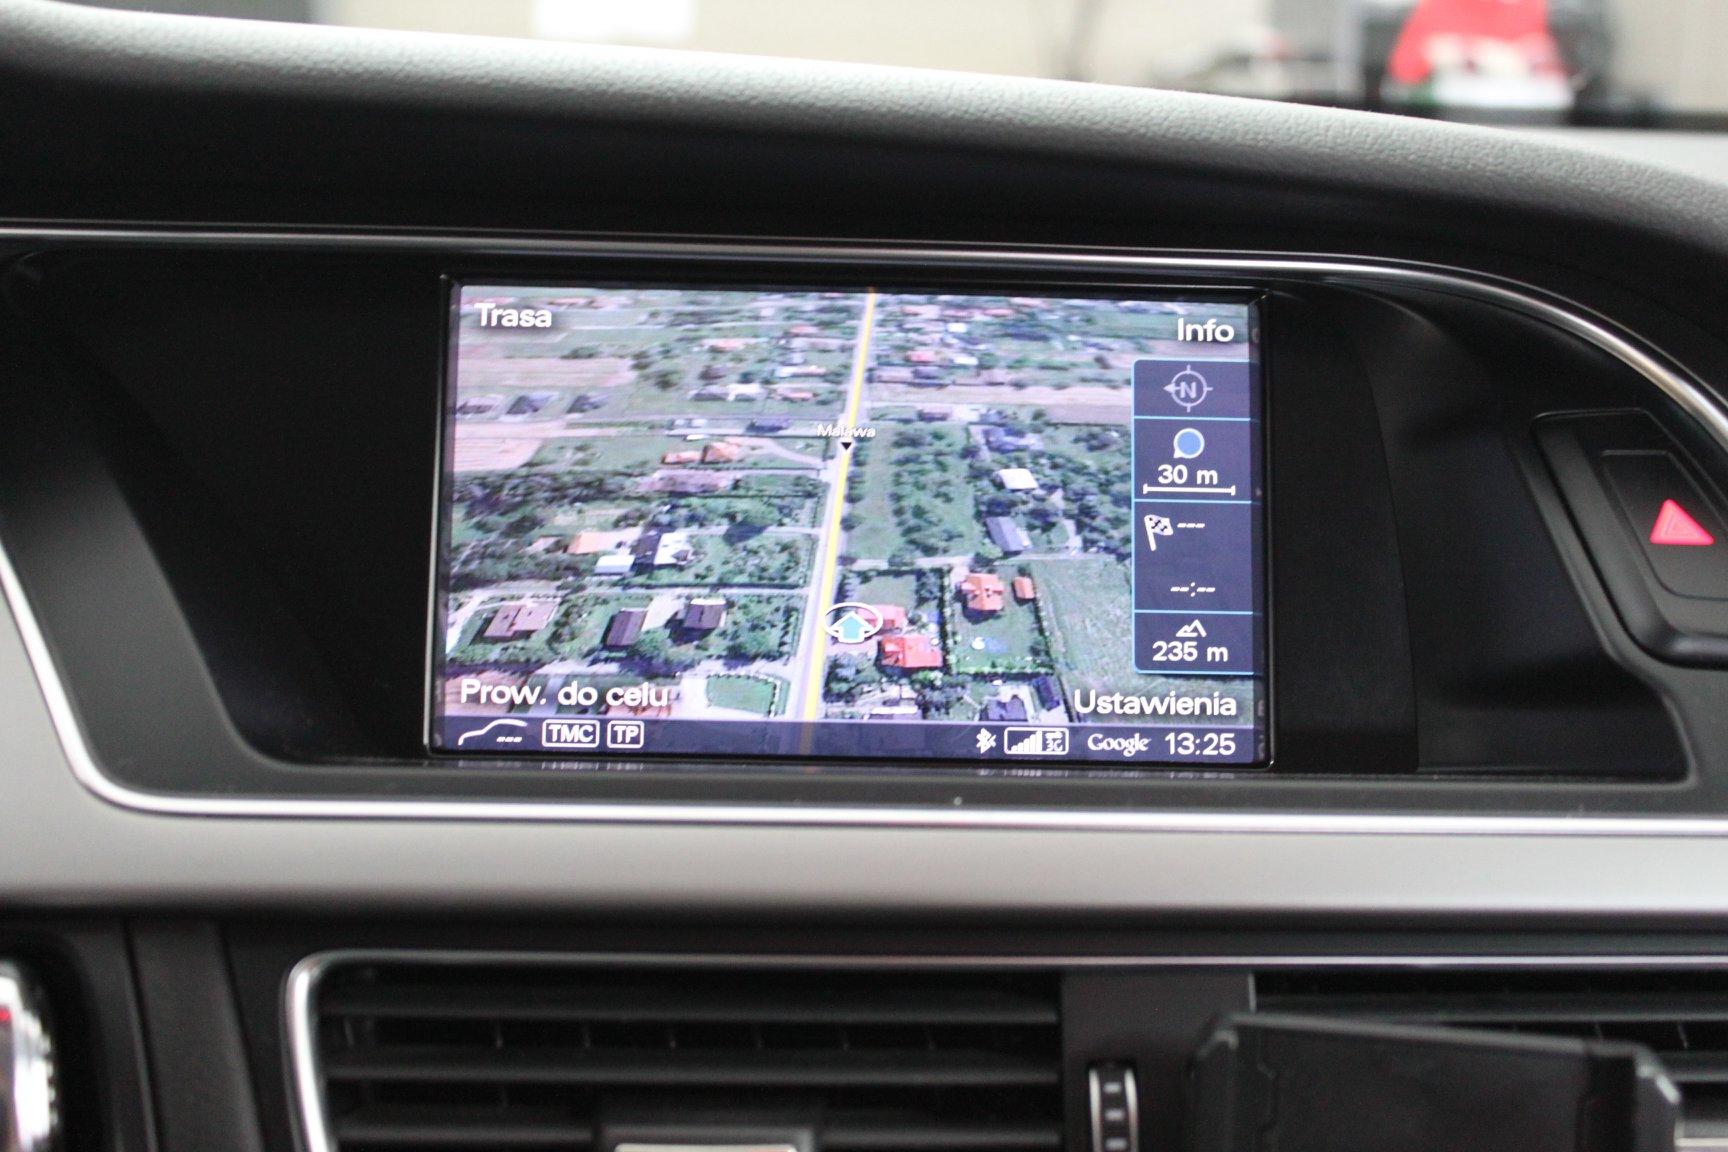 AUDI A4 B8 LIFT2014 2.0 TDI